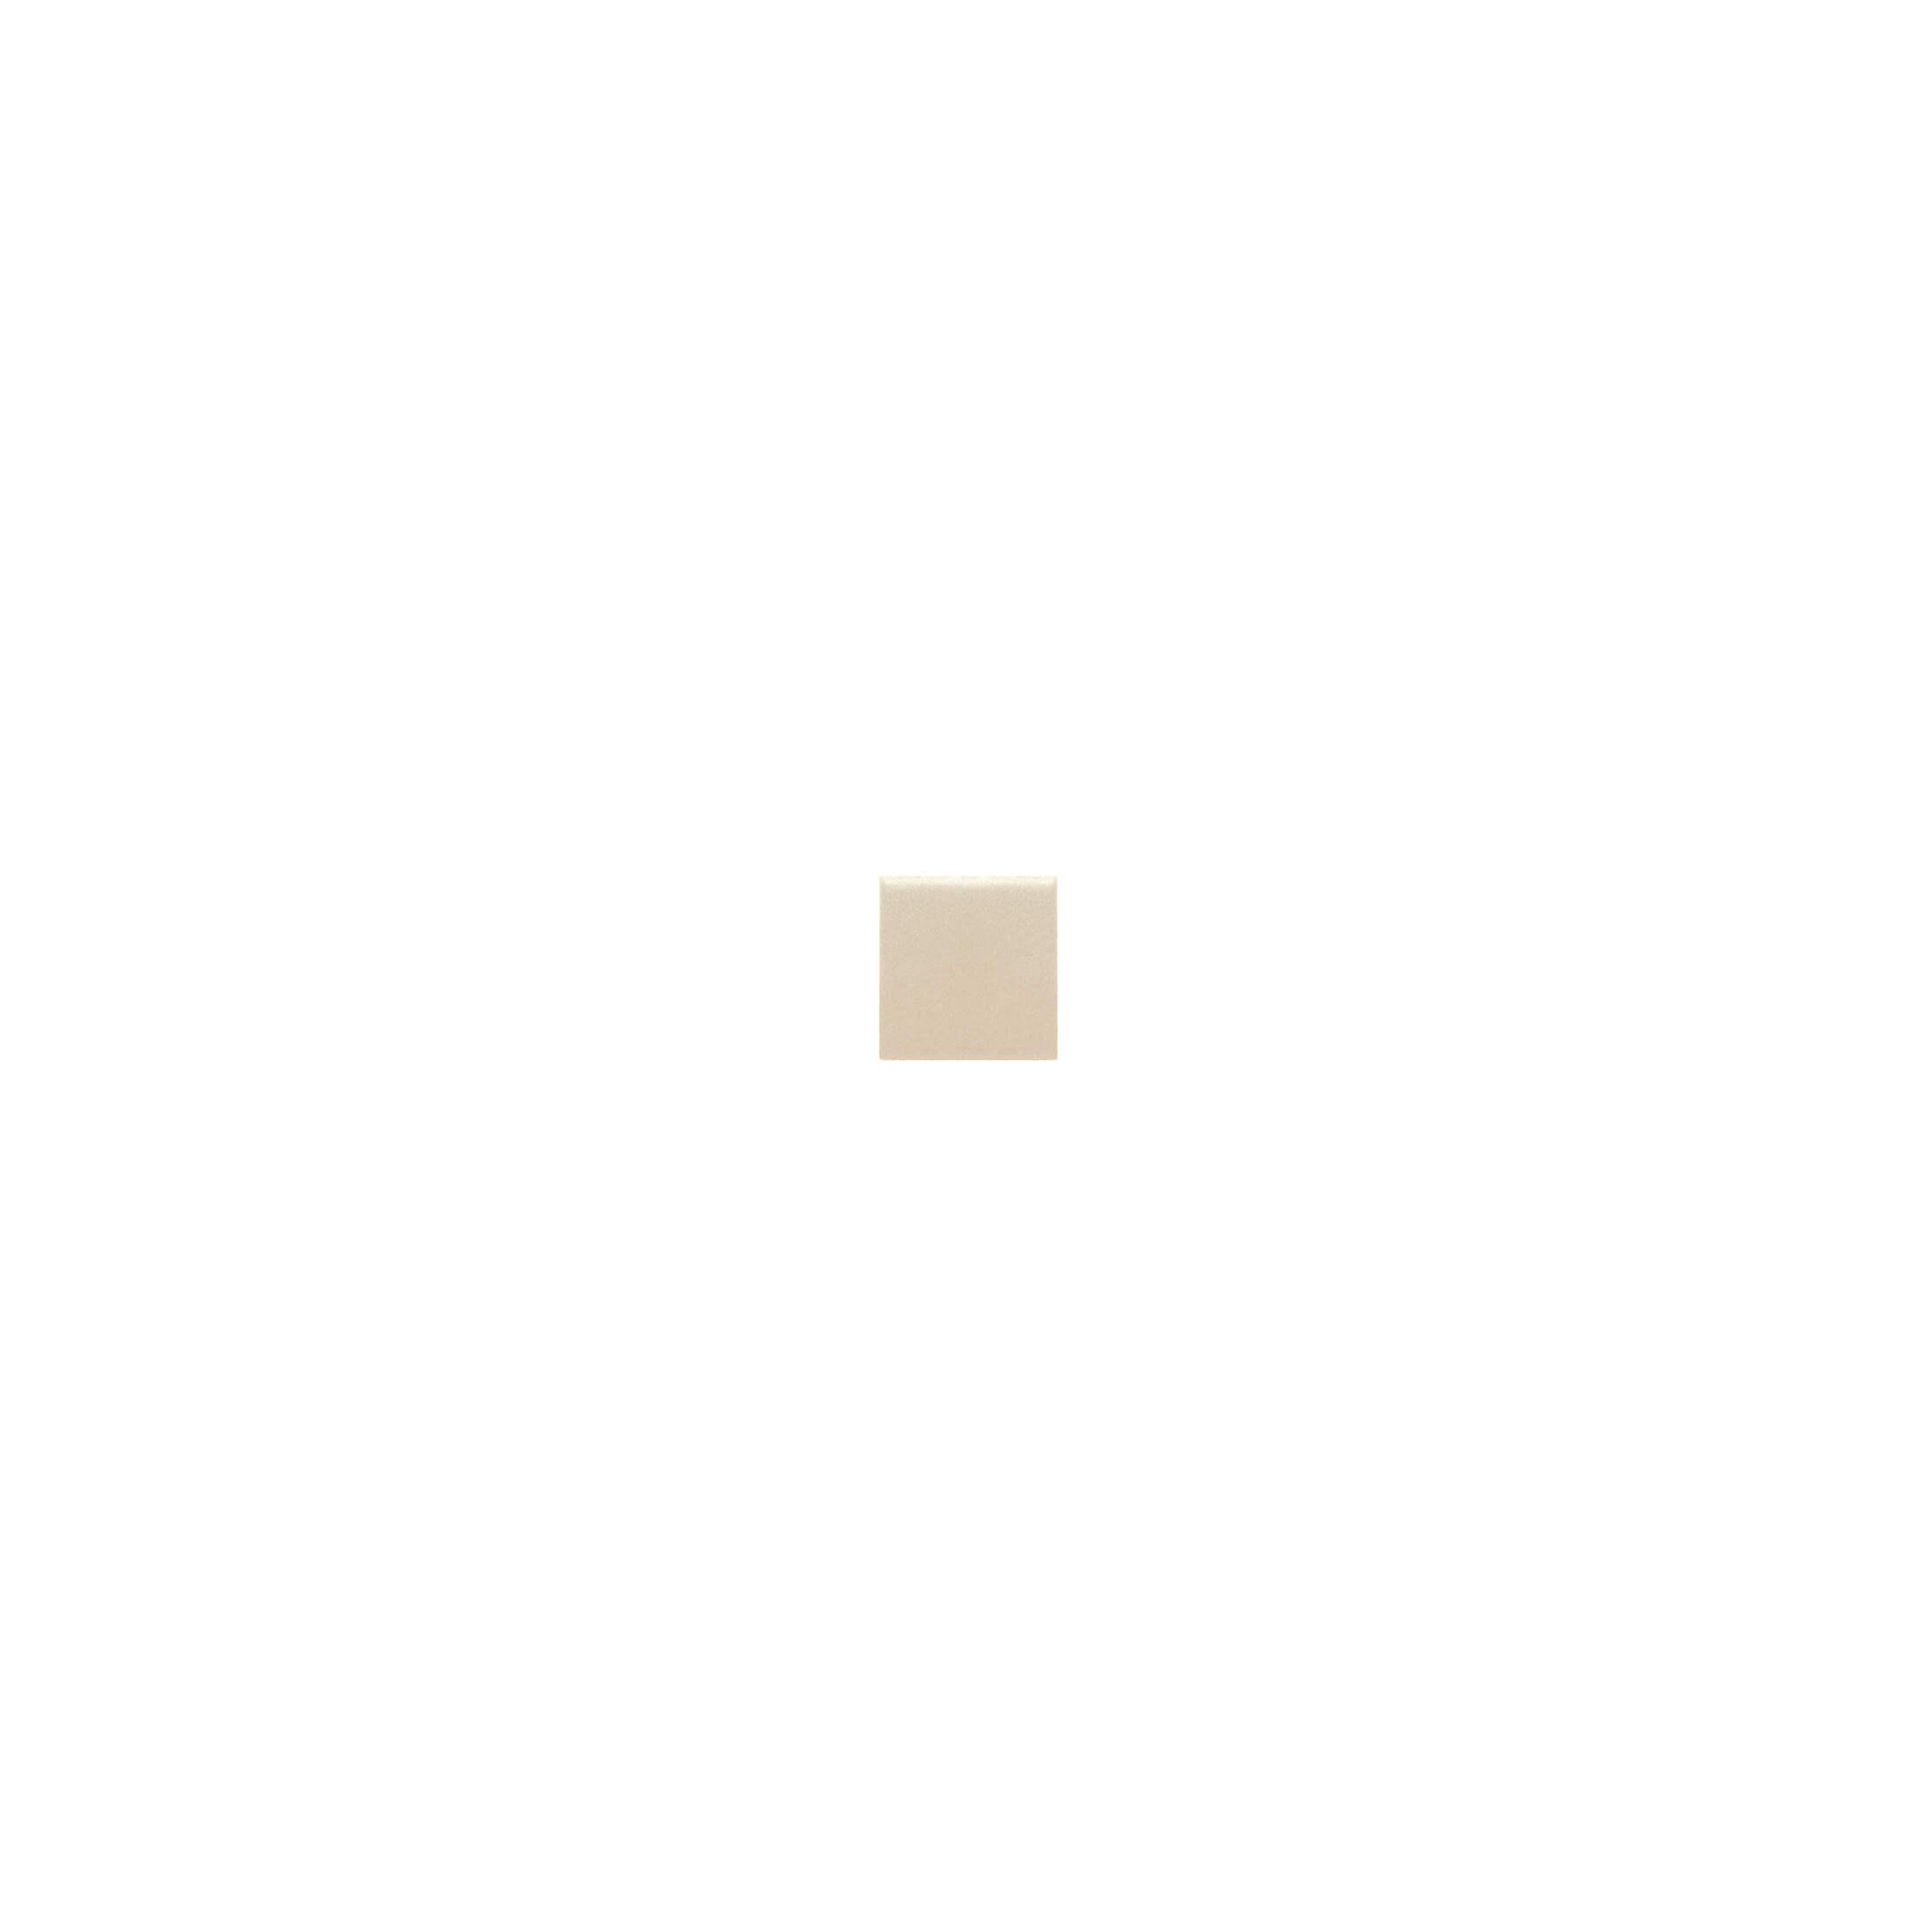 ADPV9009 - PAVIMENTO TACO SAND - 3 cm X 3 cm